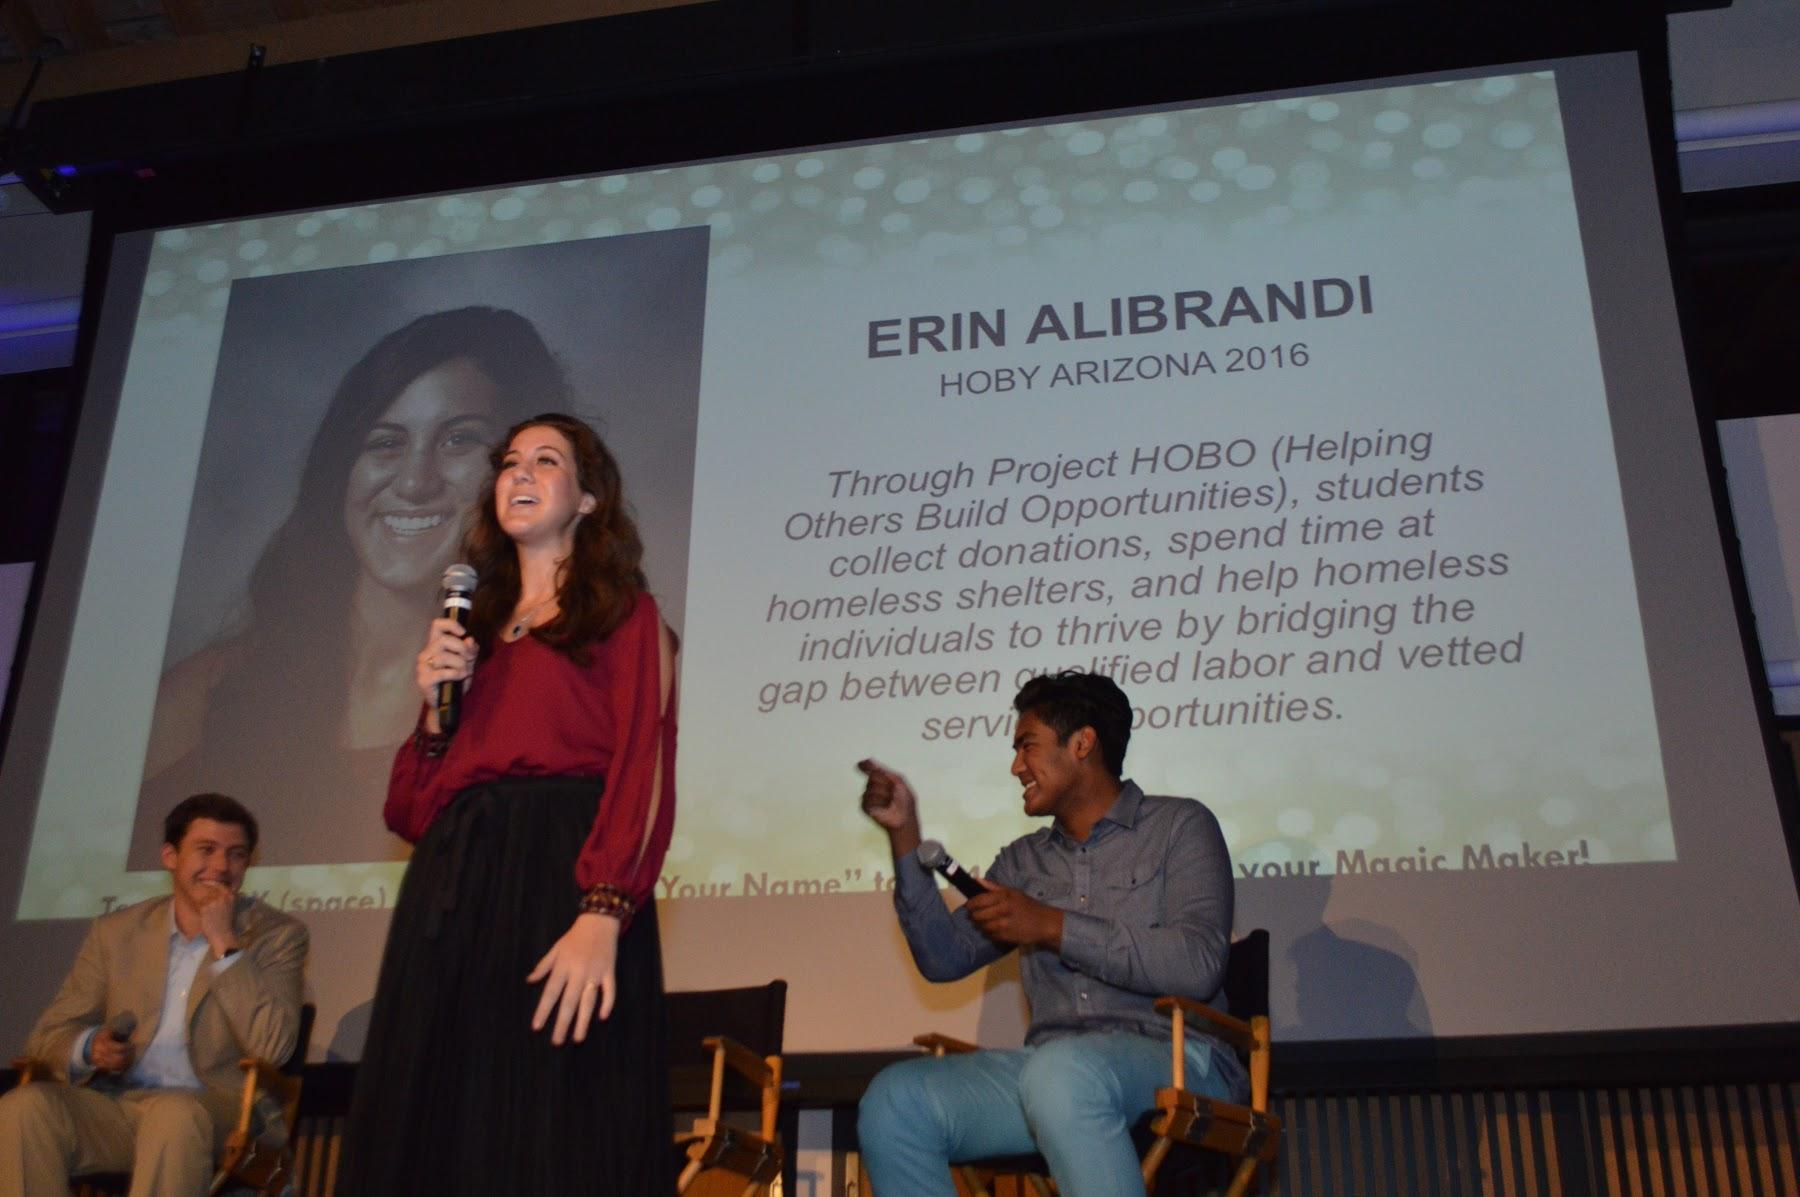 Erin Alibrandi presents at HOBY International's Magic Makers